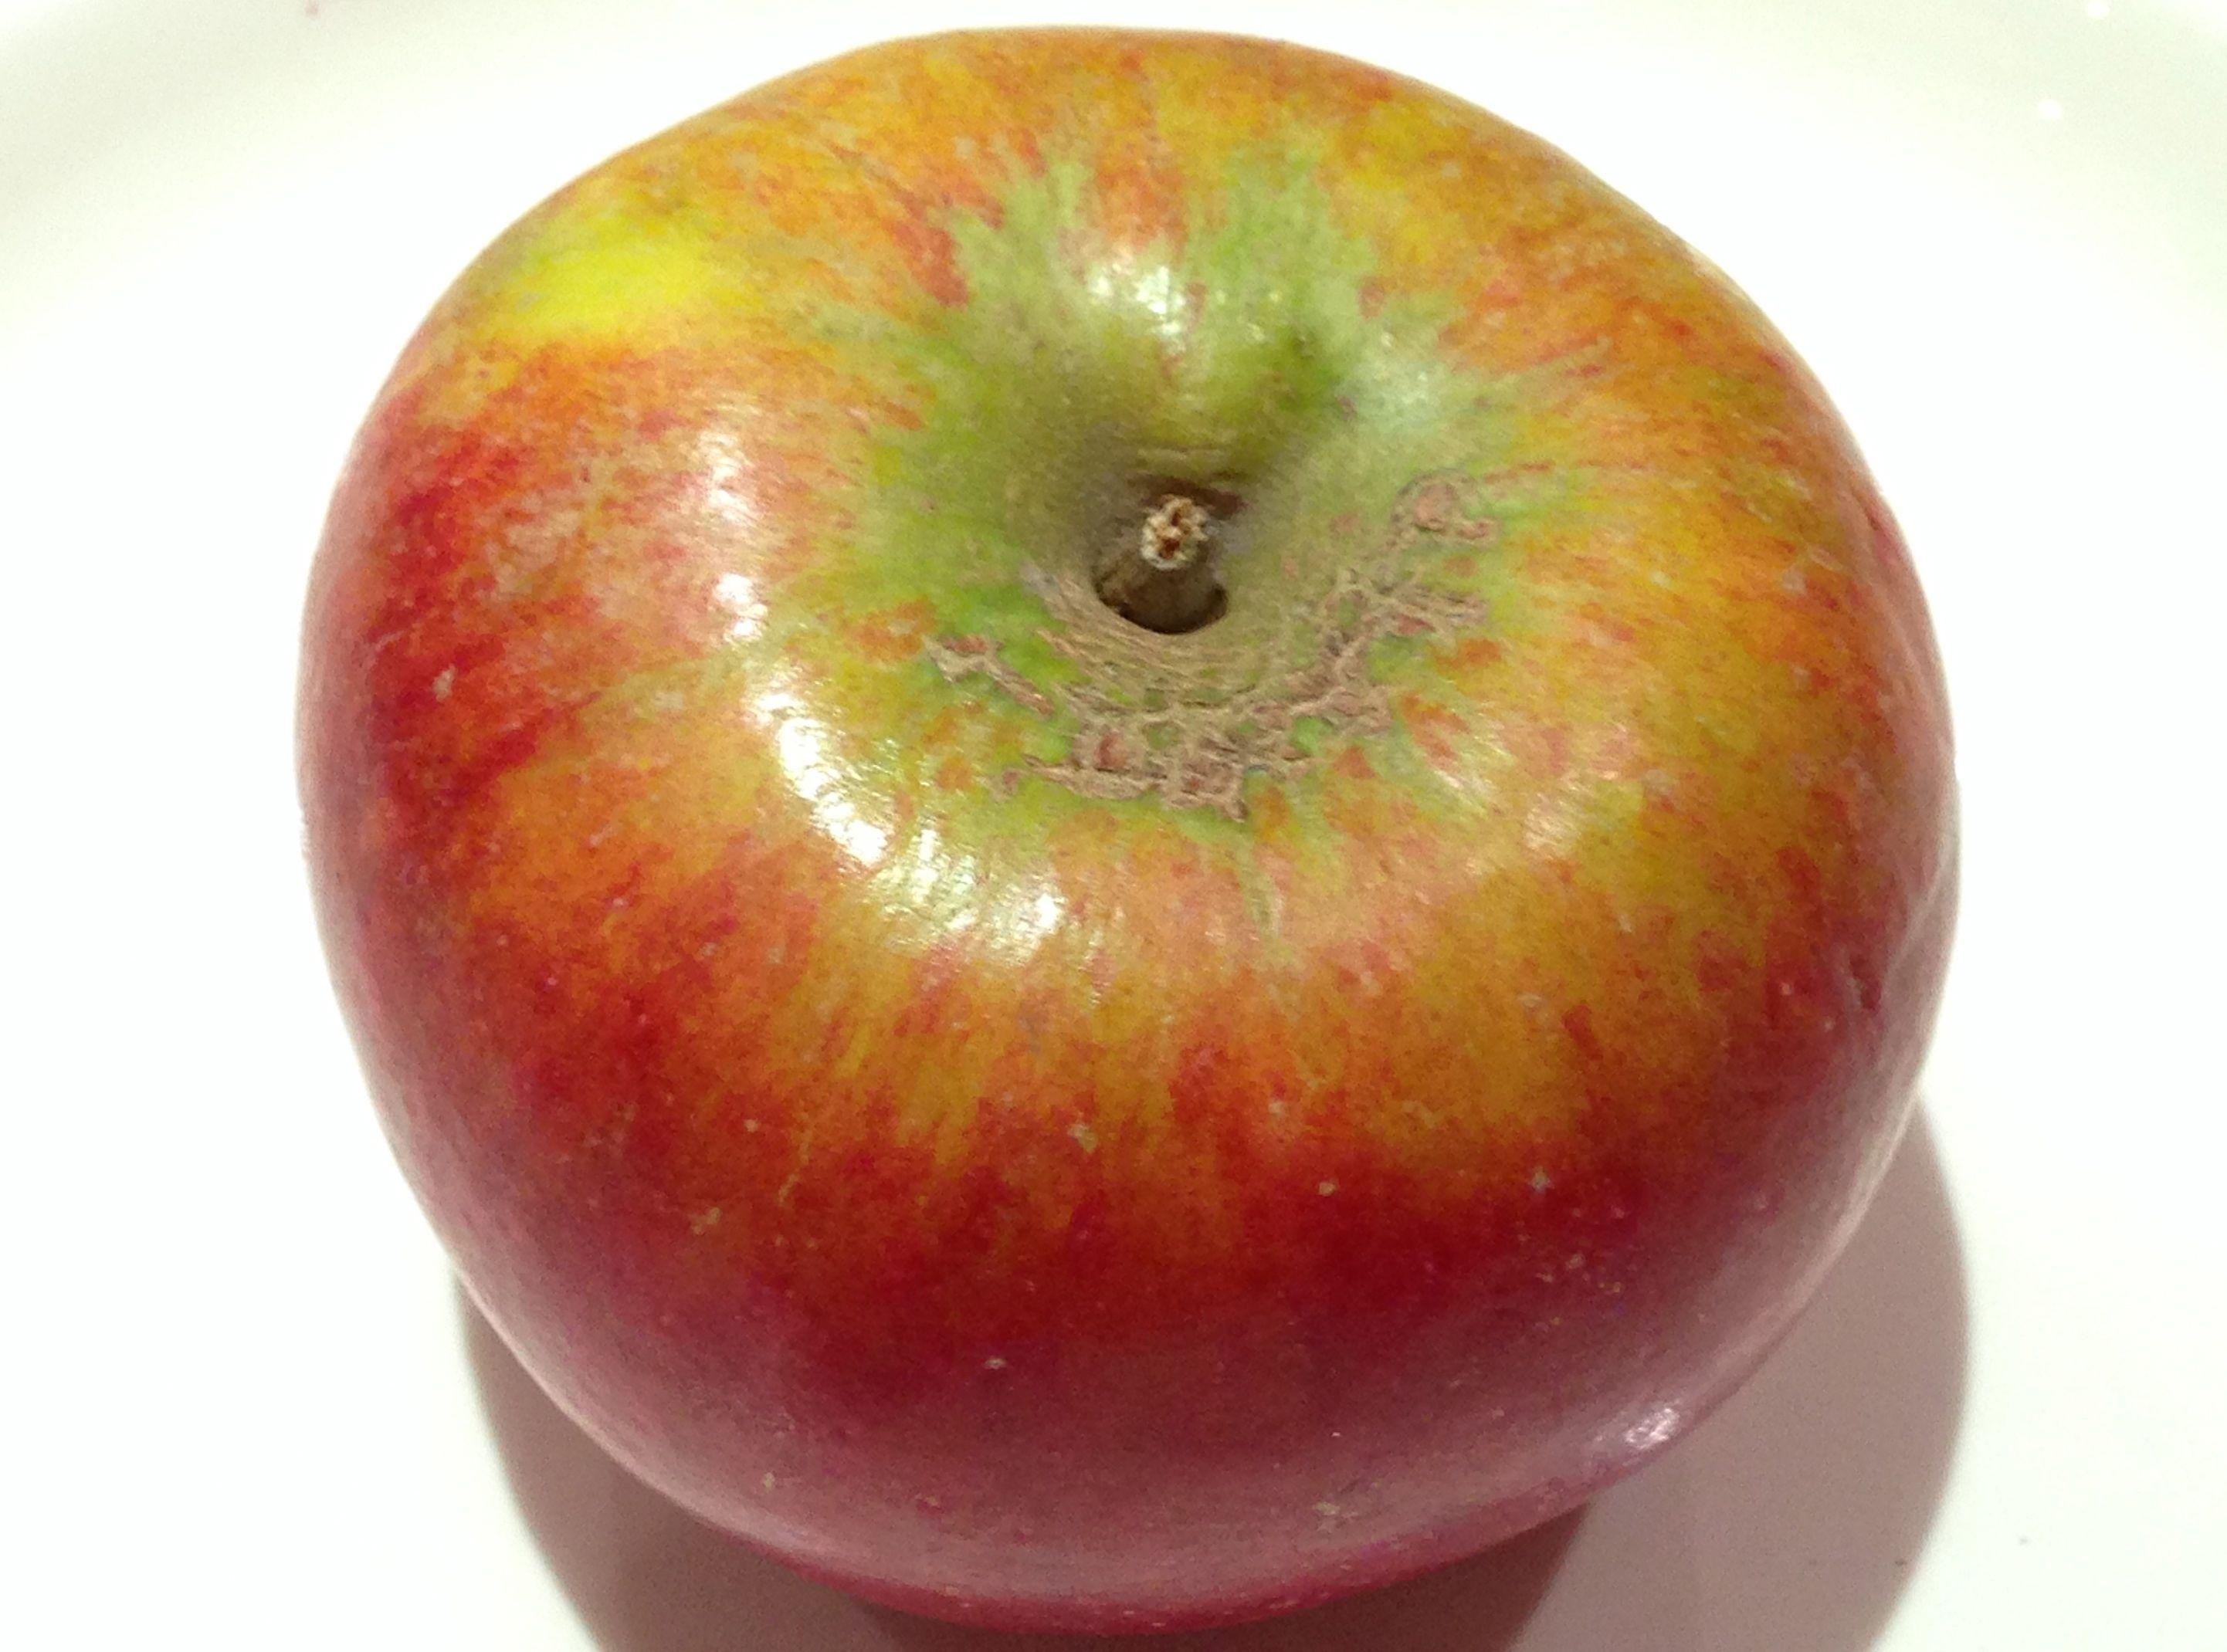 image for a pomme de reinette apple